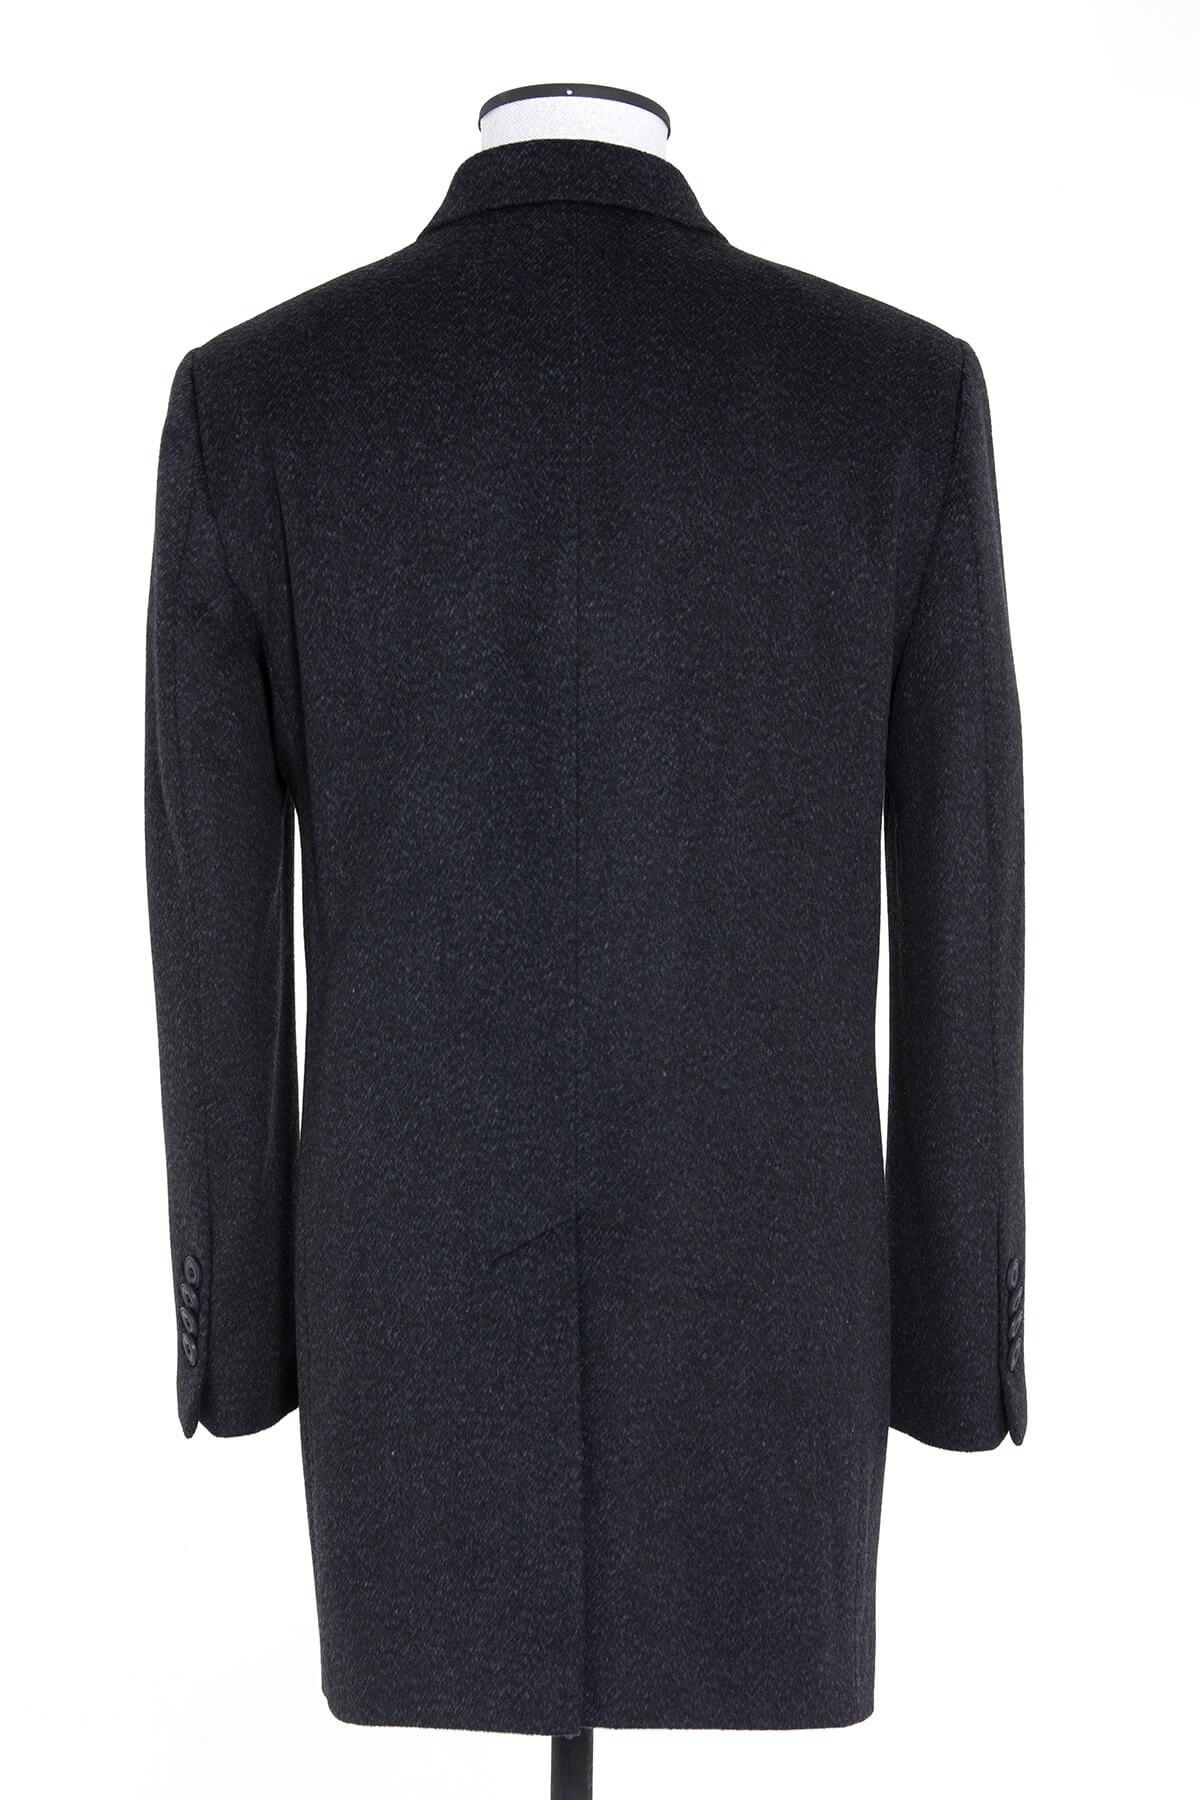 Lacivert Desenli Ceket Yaka Palto